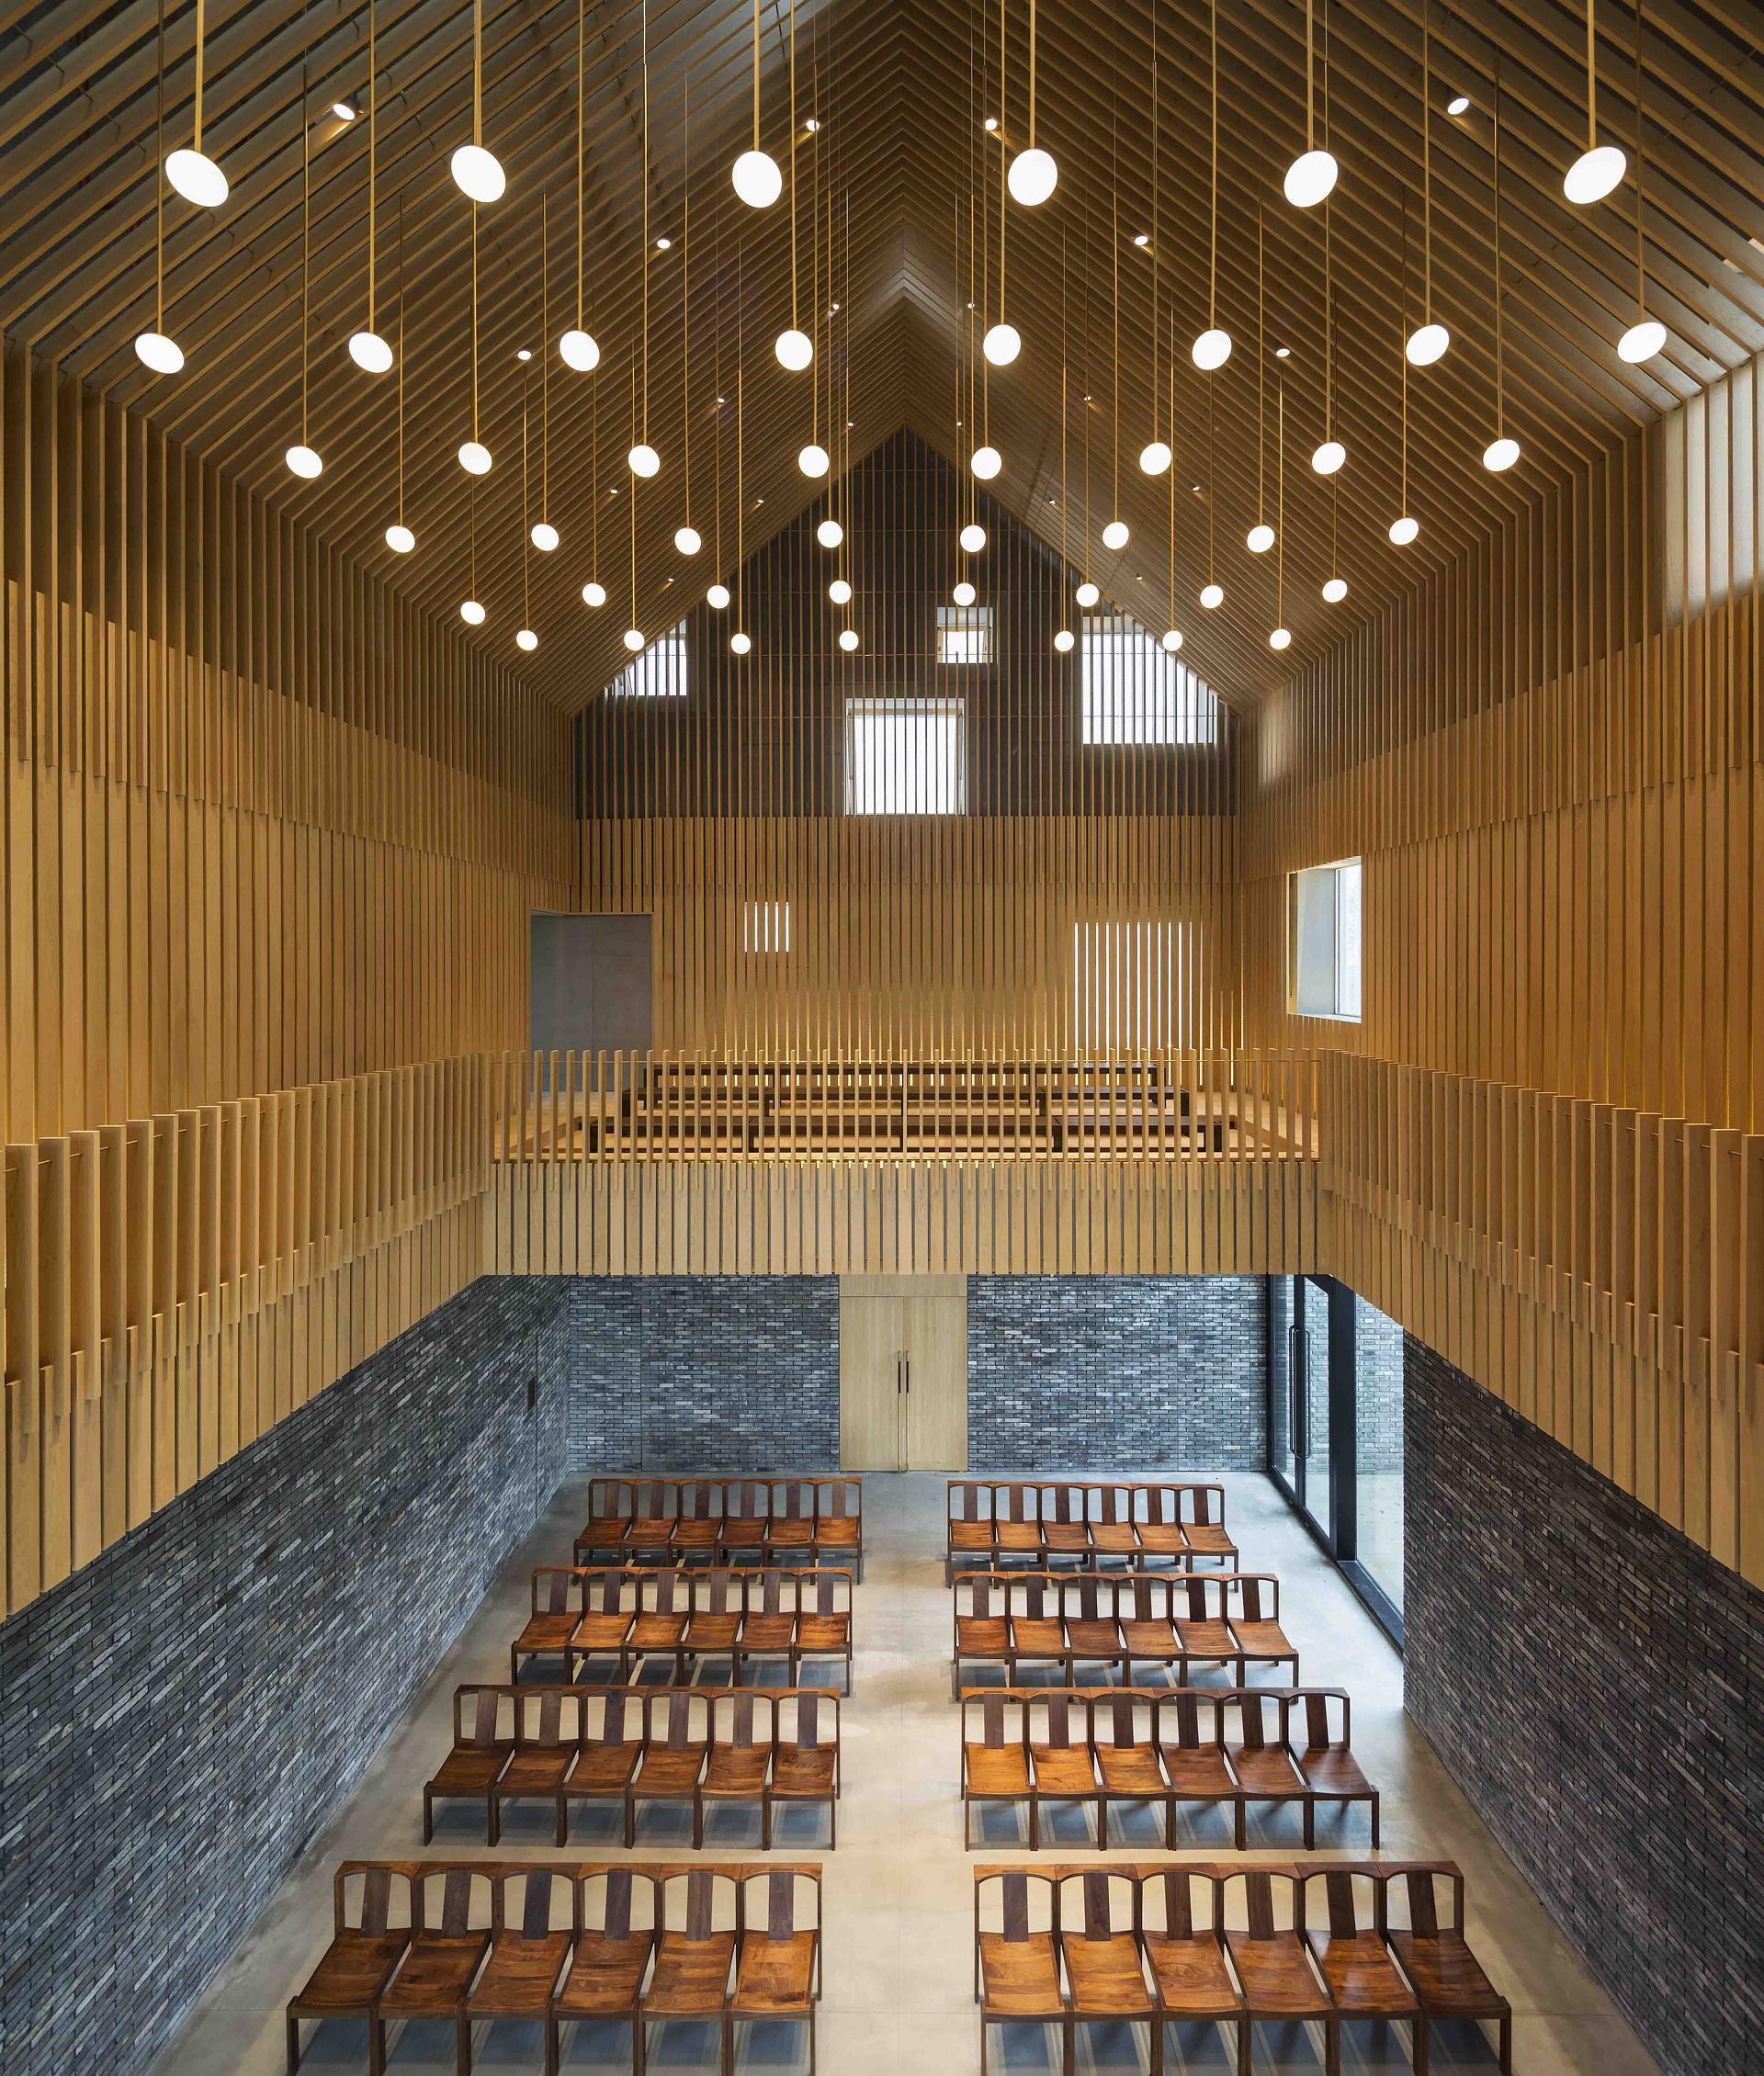 Neri&Hu et la chapelle Suzhou